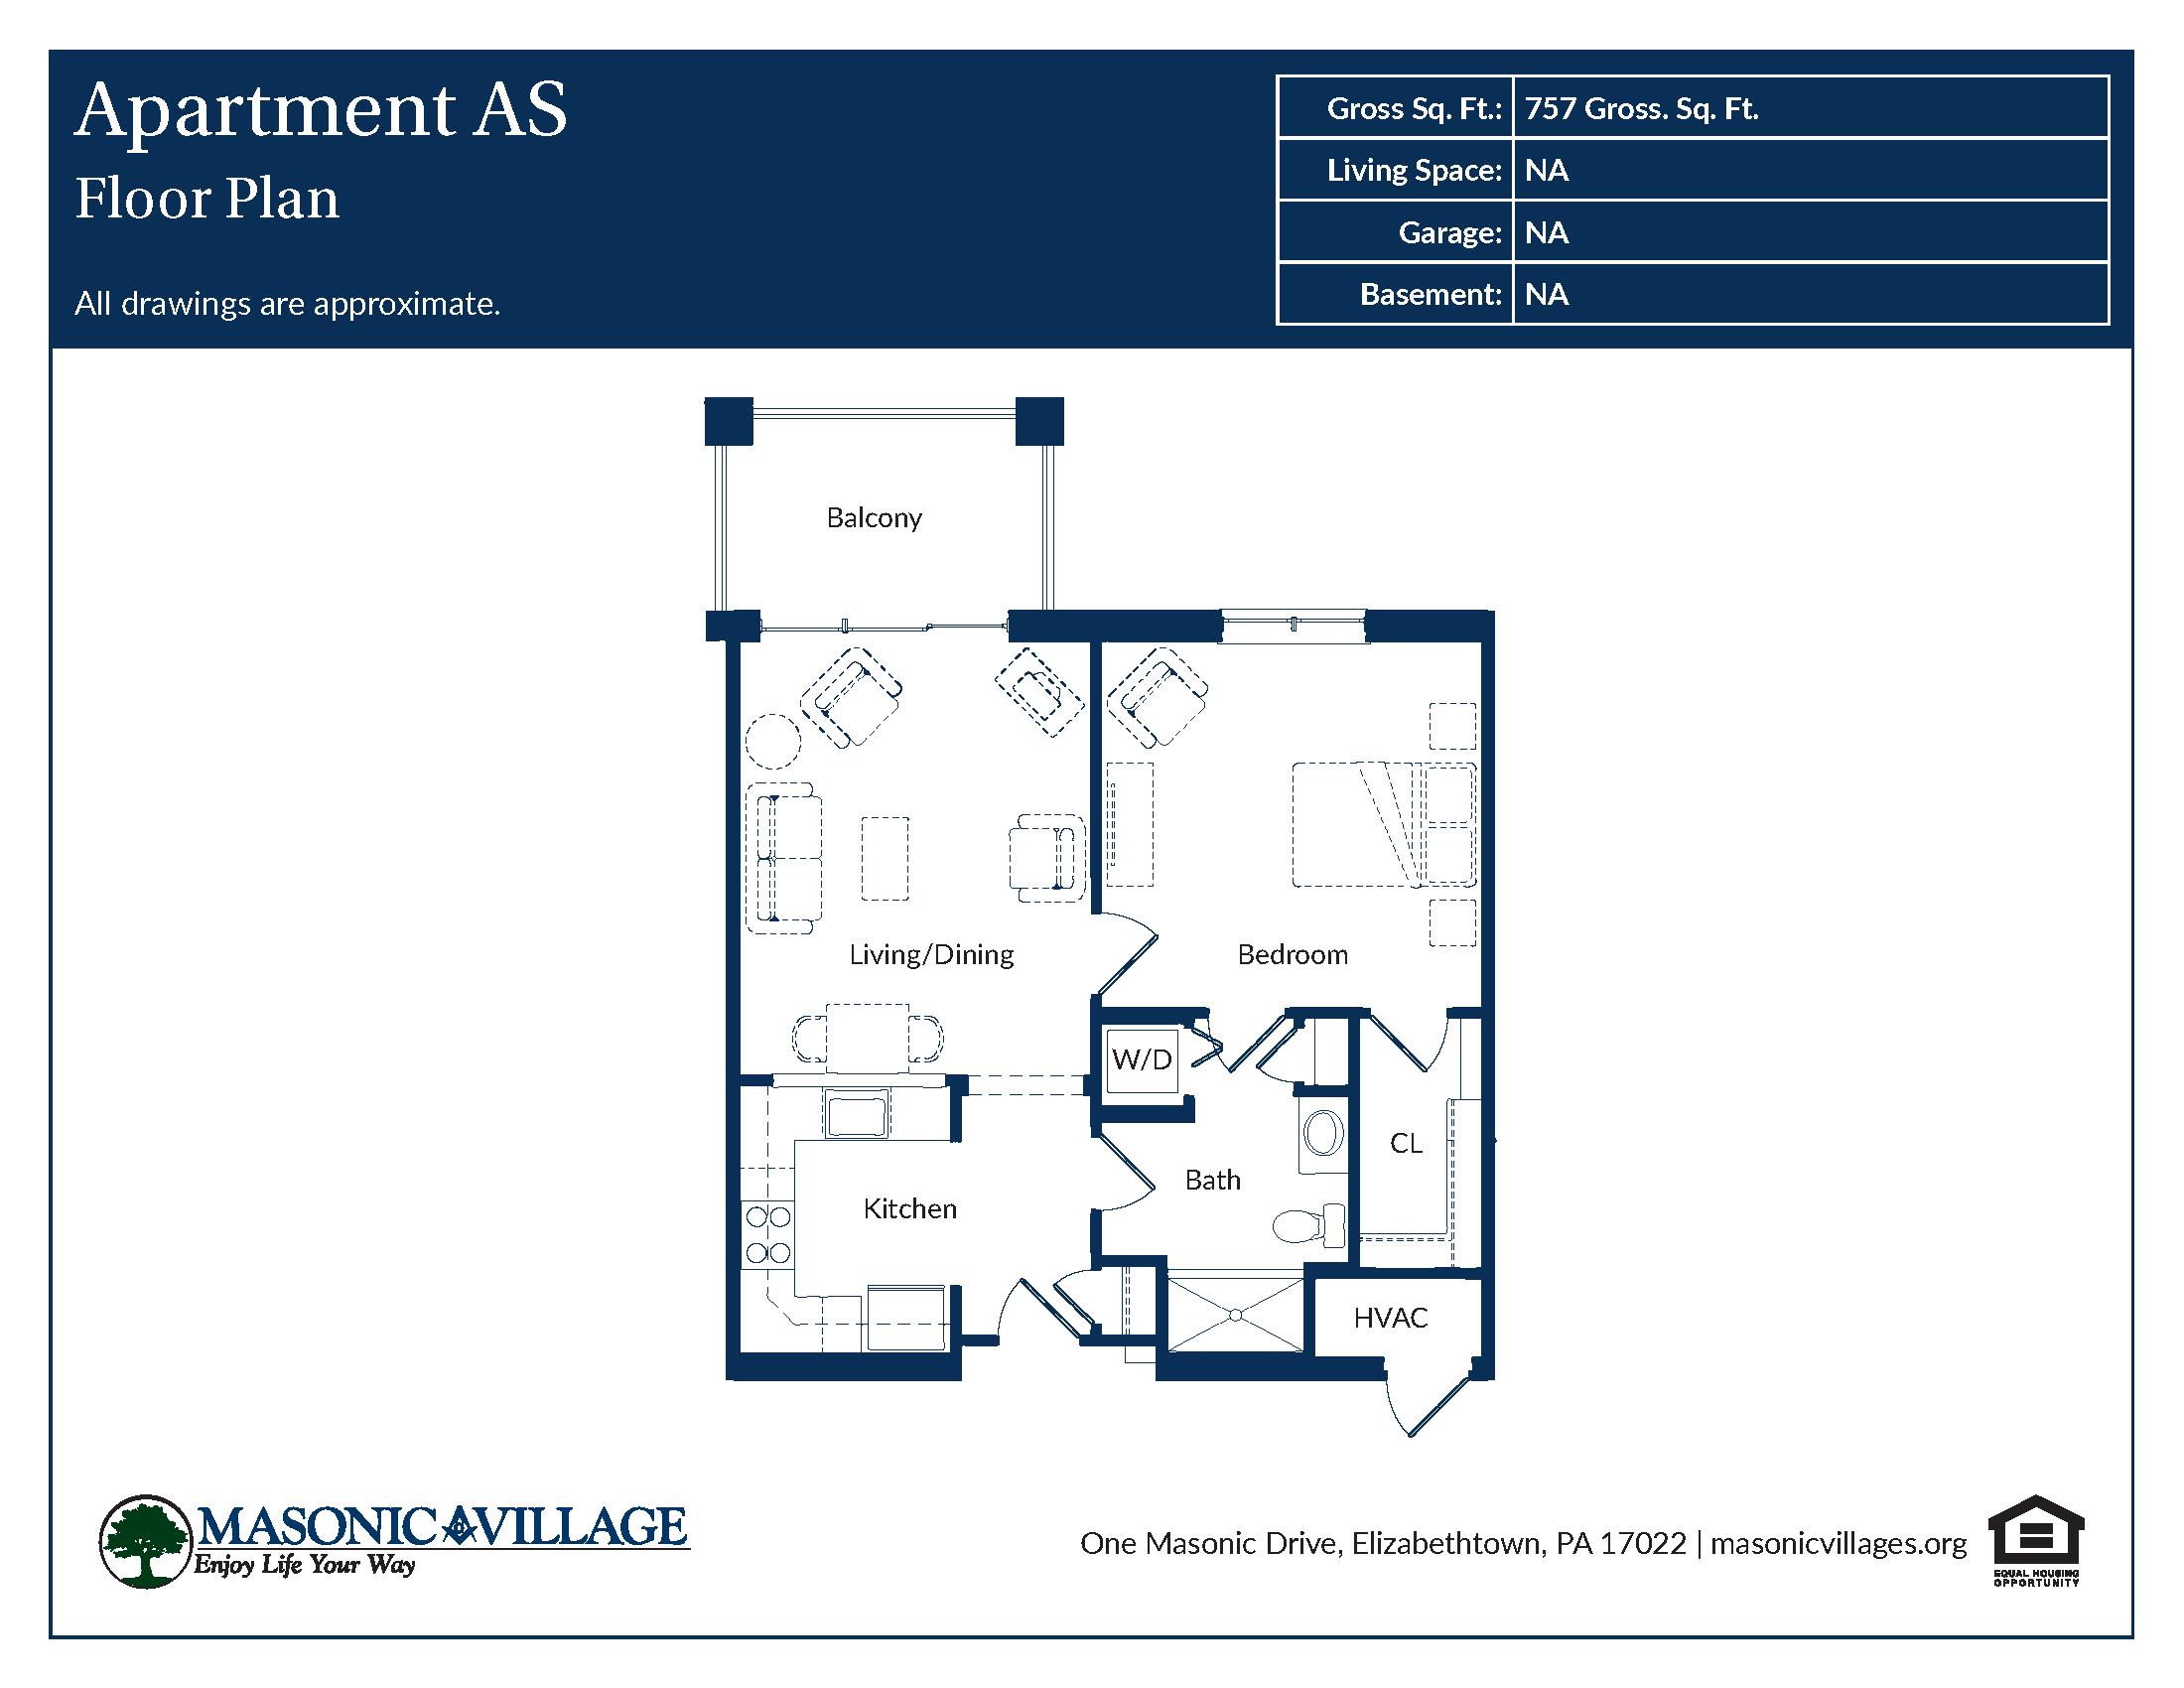 Masonic Village at Elizabethtown - Apartment AS Floor Plan